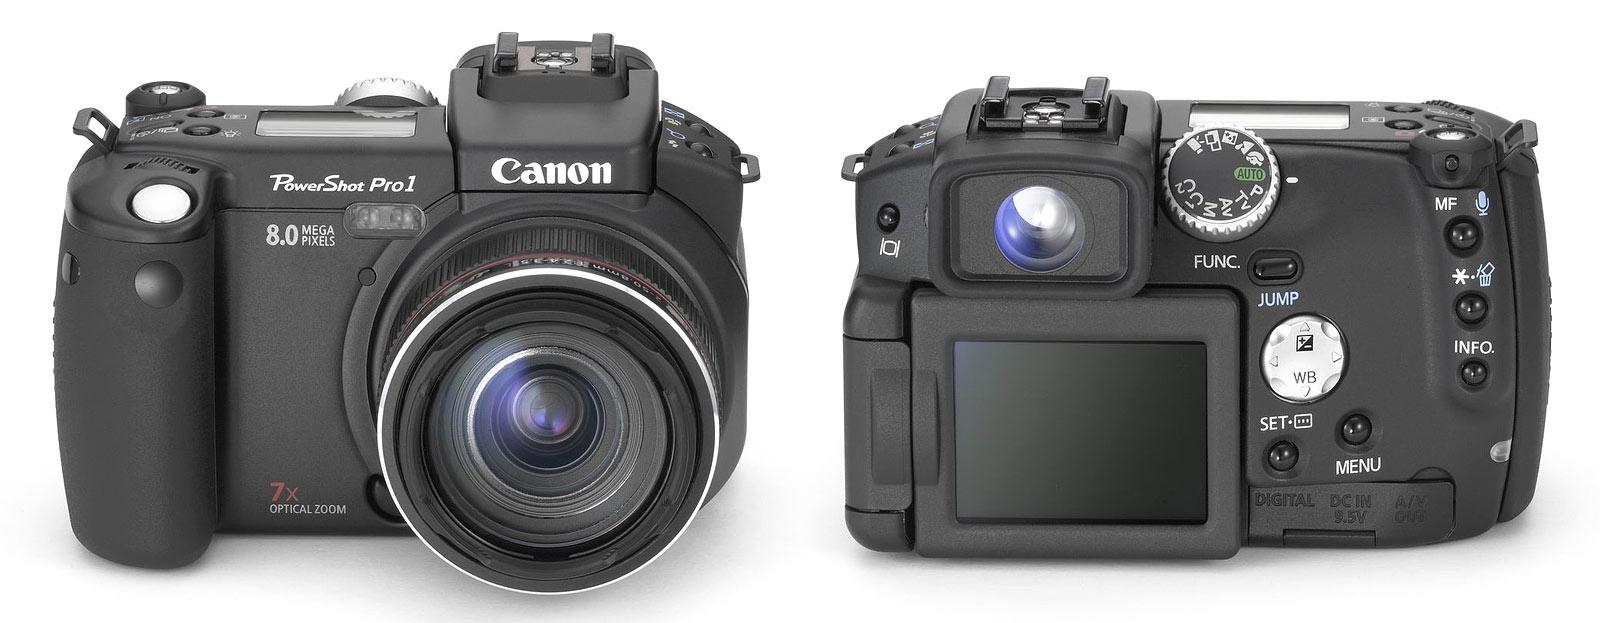 Canon PowerShot Pro1 Camera Twain Driver (2019)